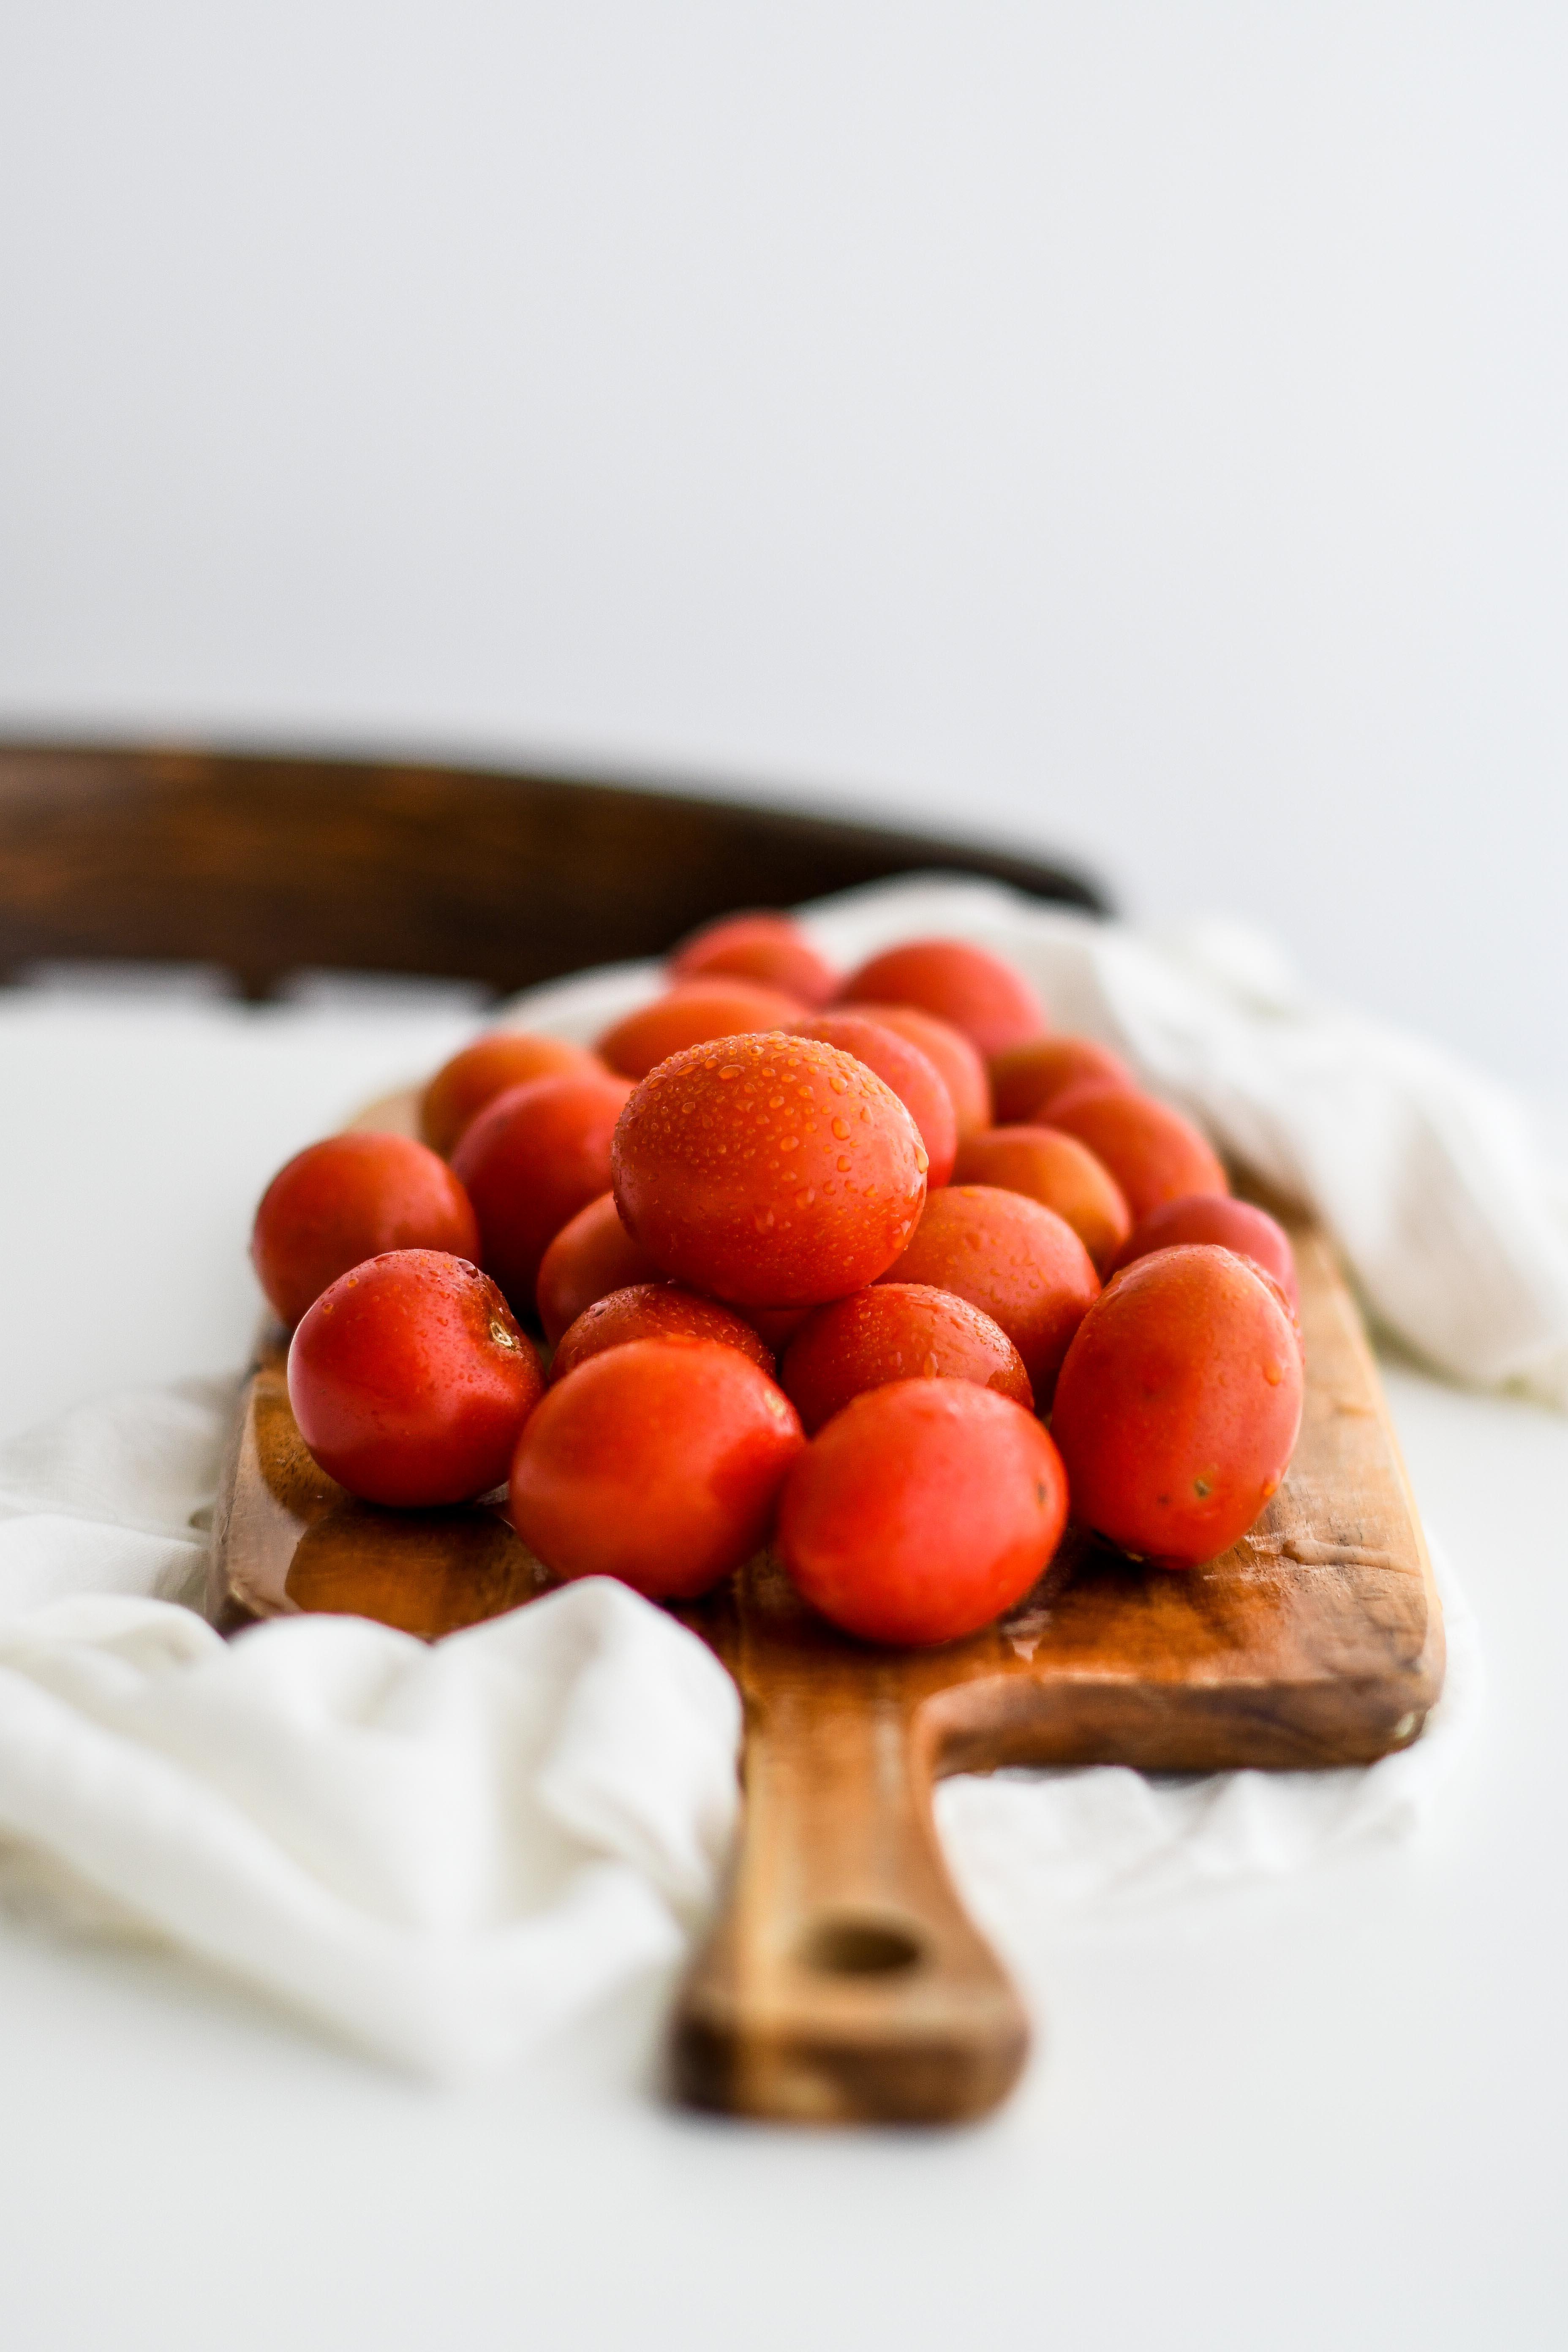 paradajky / tomatoes